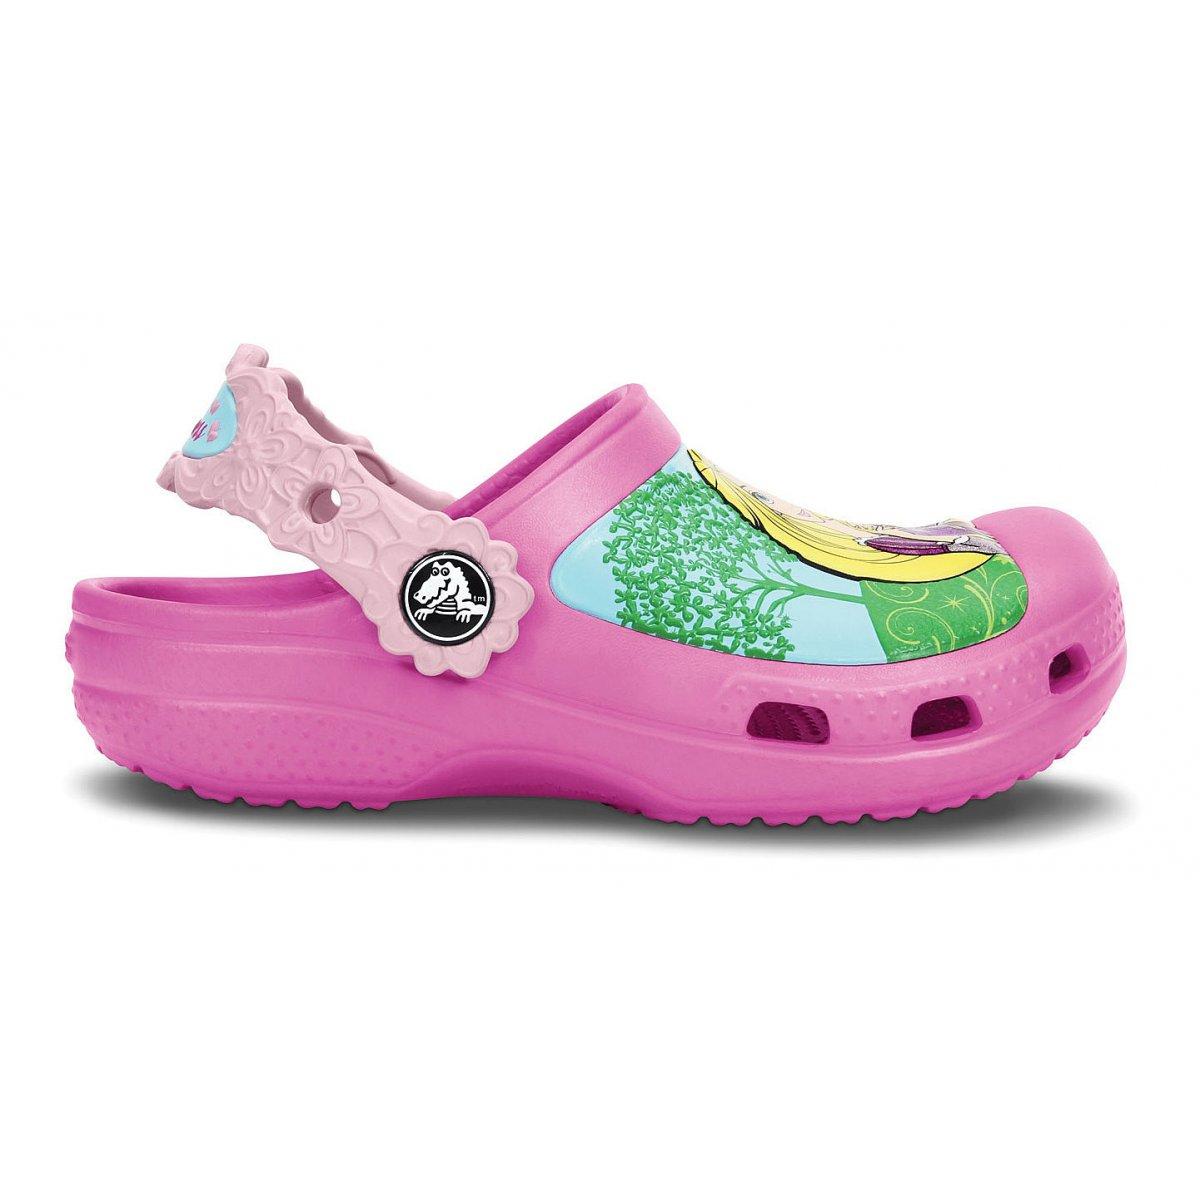 negozio online 83e77 de35b Creative Crocs Princess™ Kids - Sabot Footwear Bambina ...